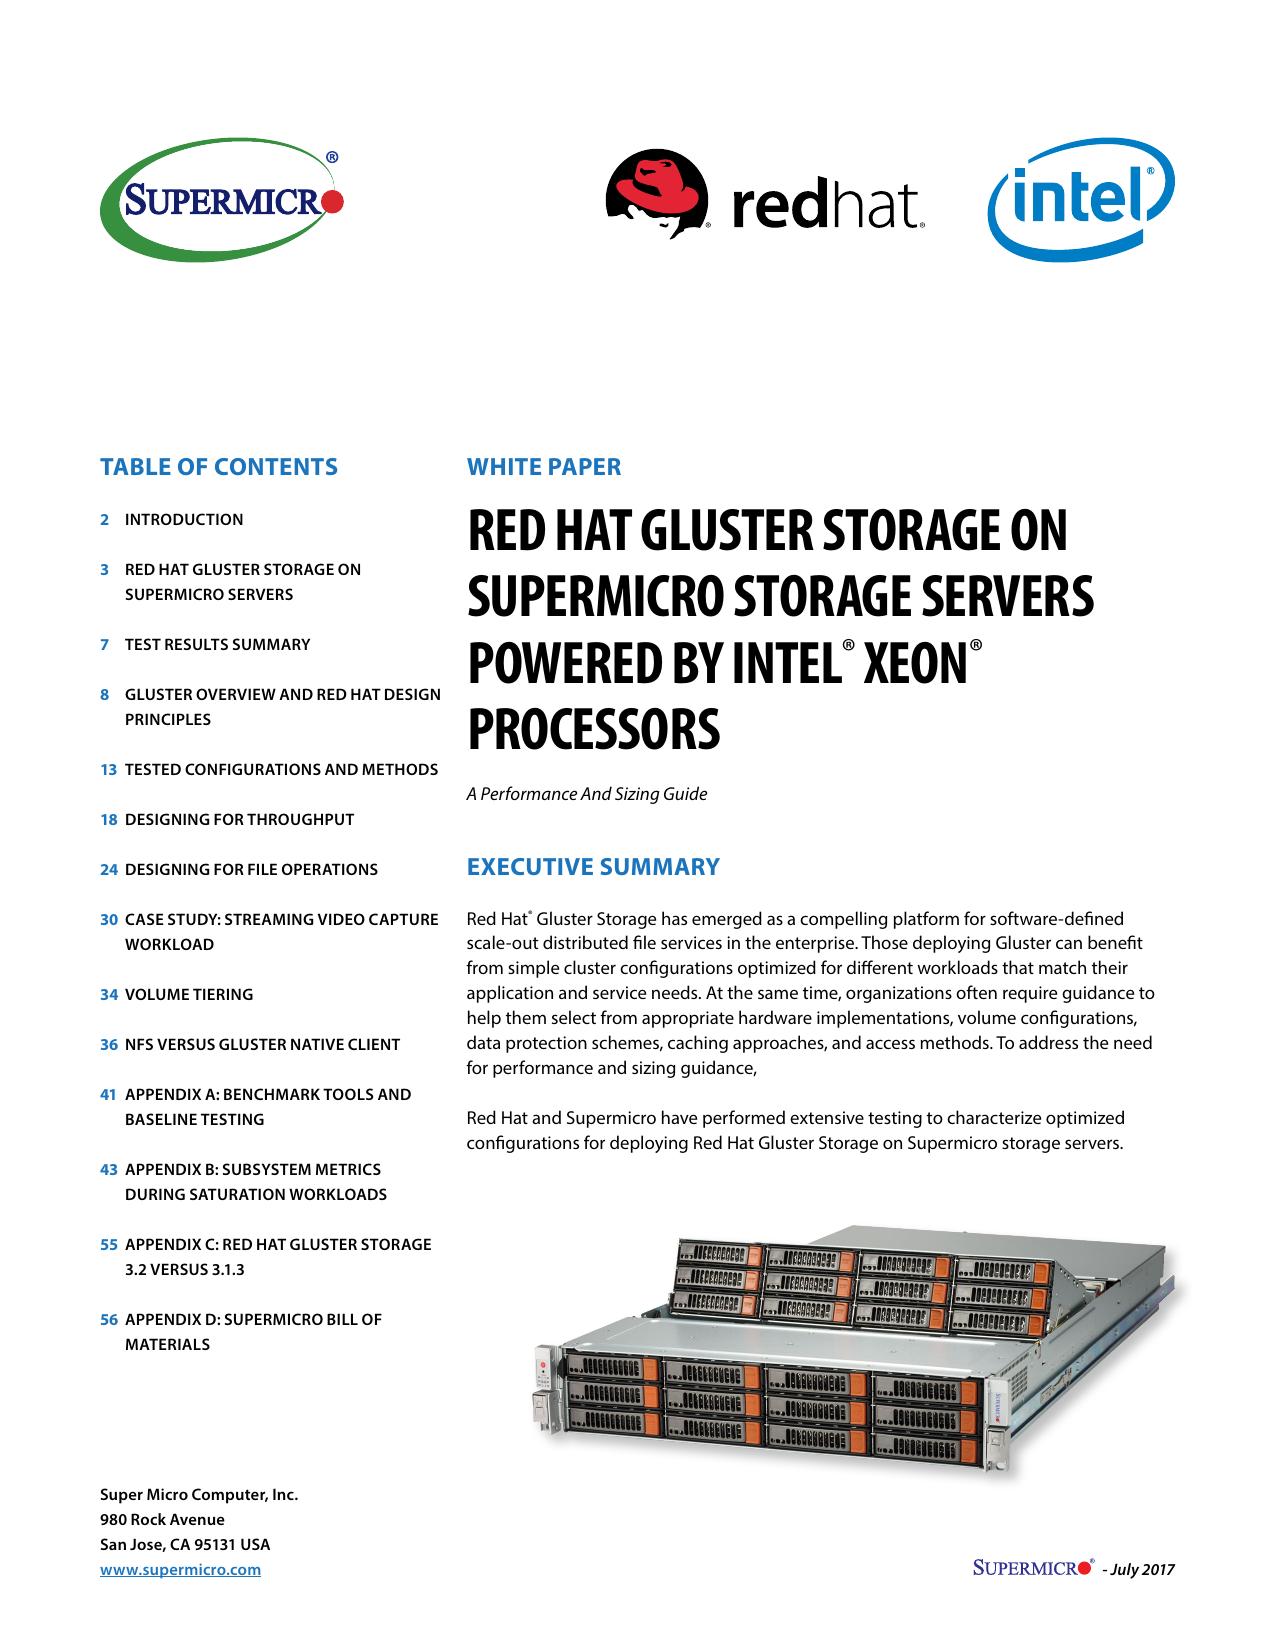 Red Hat Gluster Storage On Supermicro Storage Servers Power